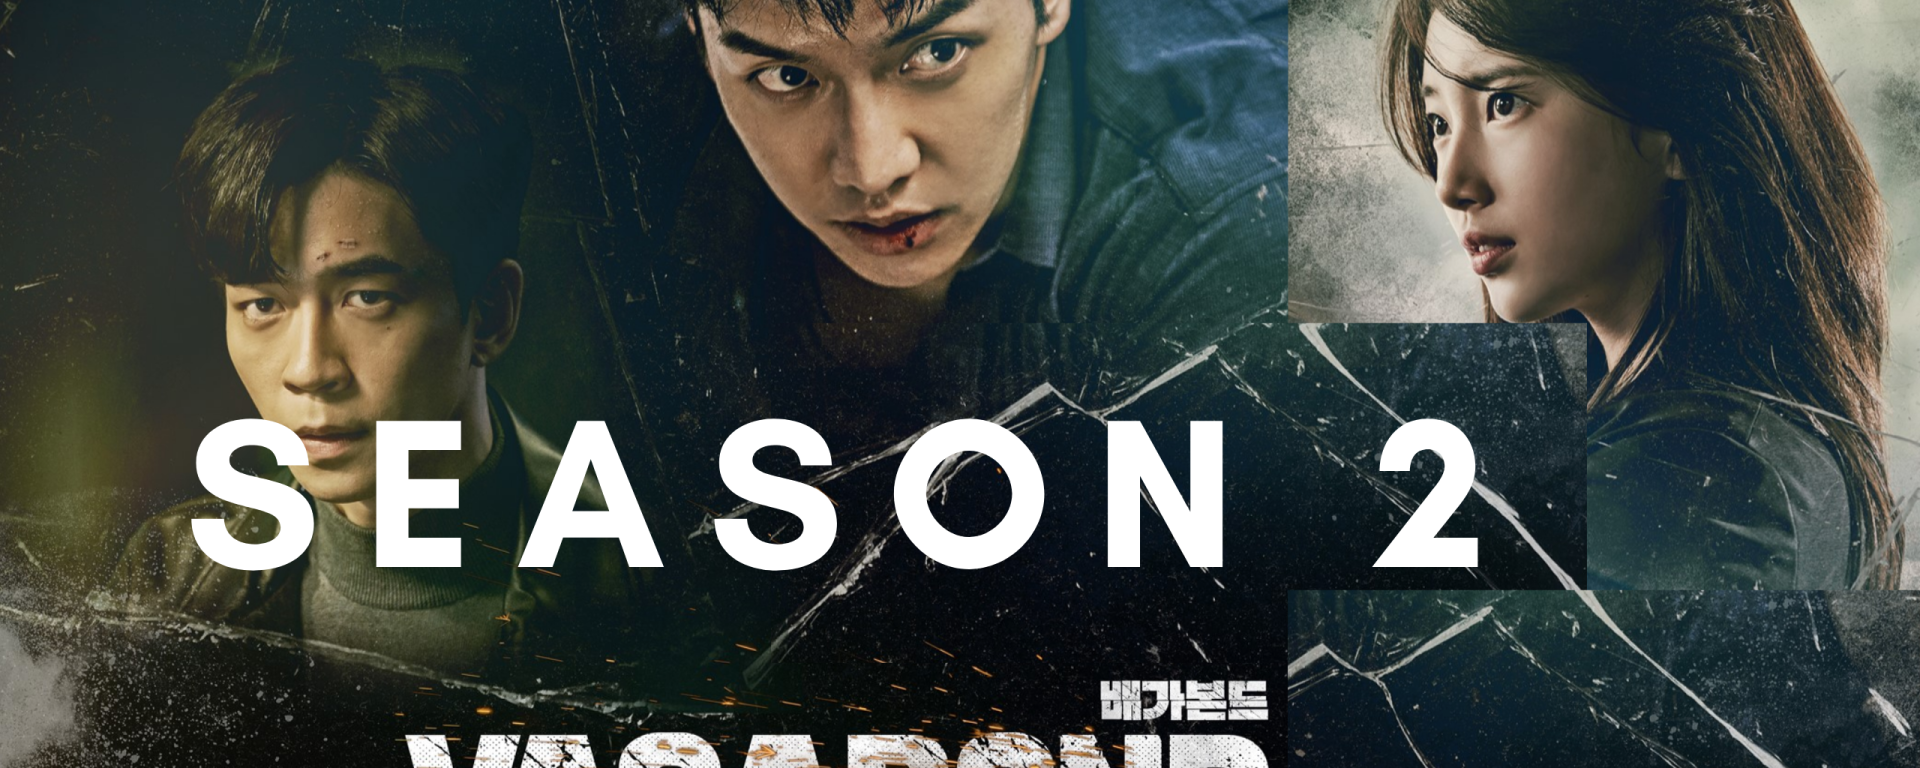 Vagabond Season 2:Release Date